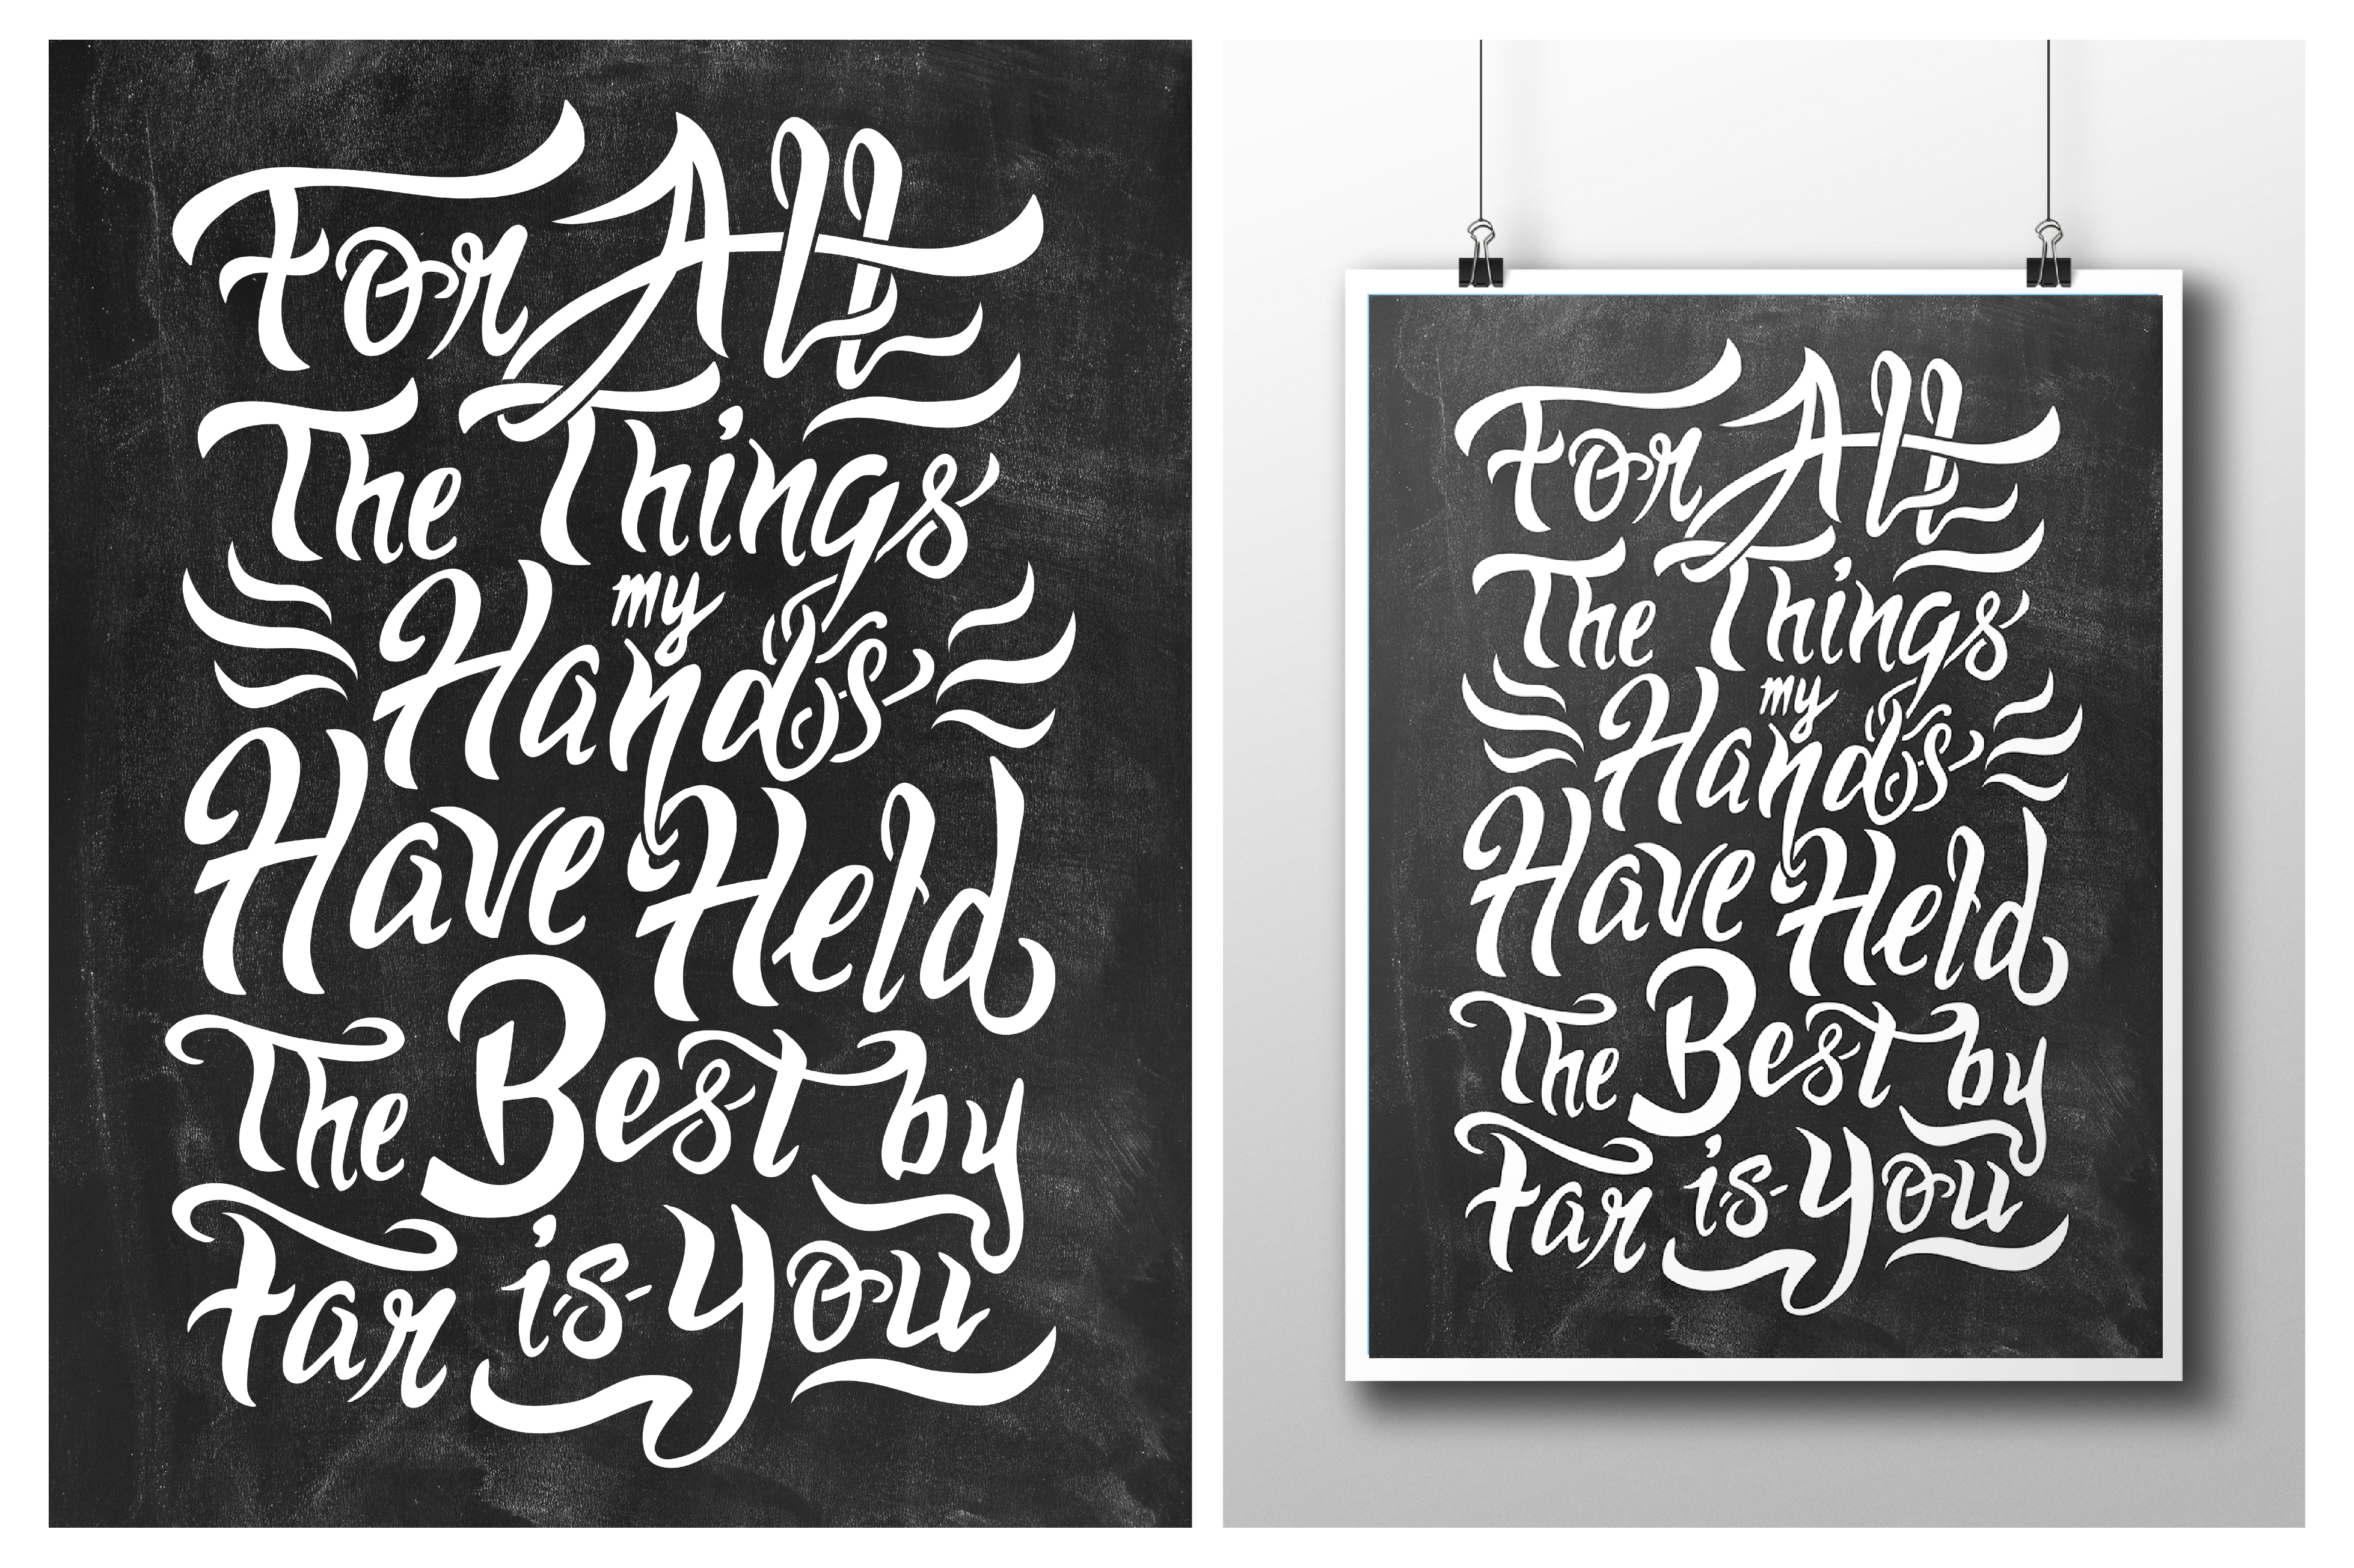 Hand Lettered Poster Design